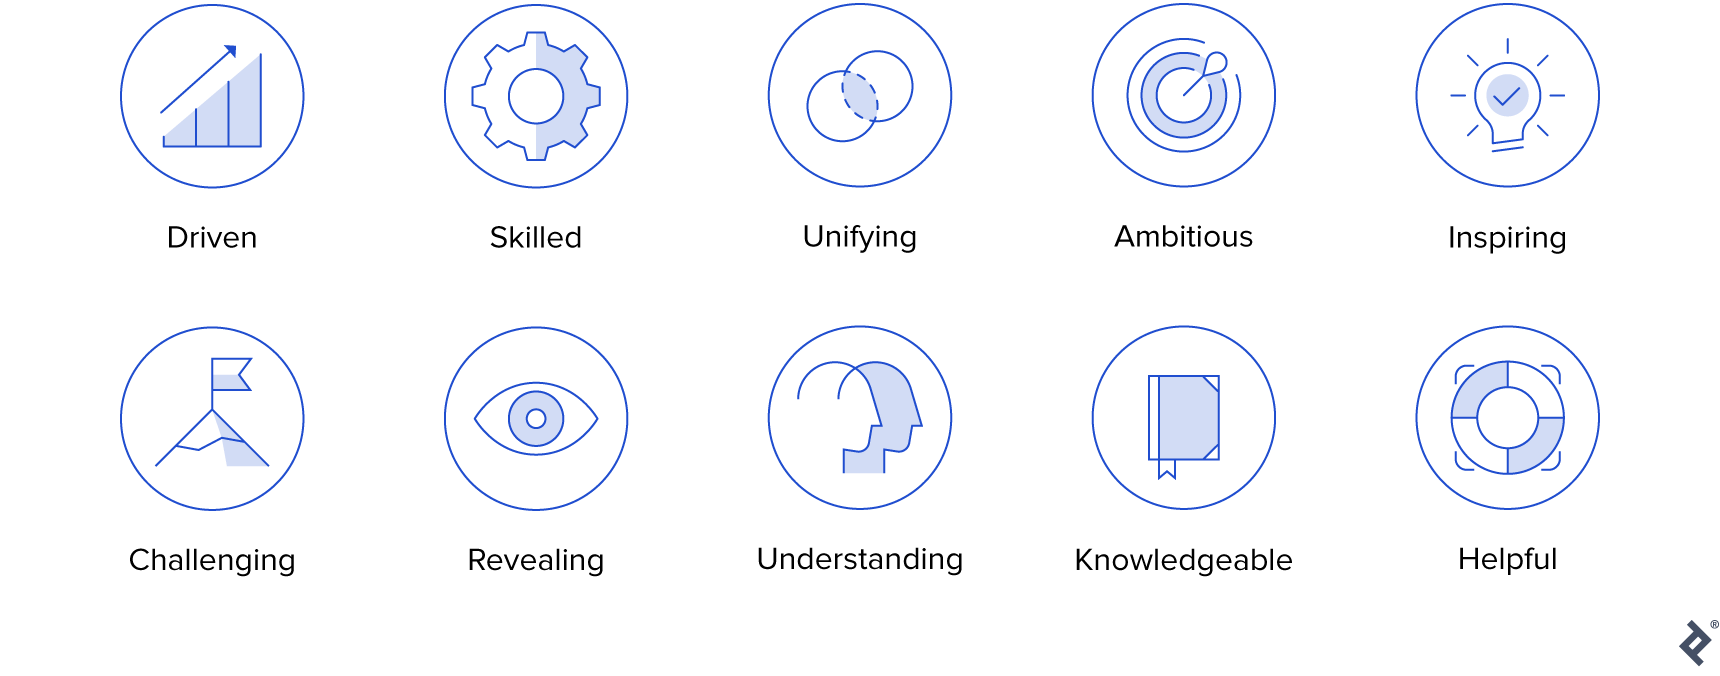 Toptal Culture: 10 core values